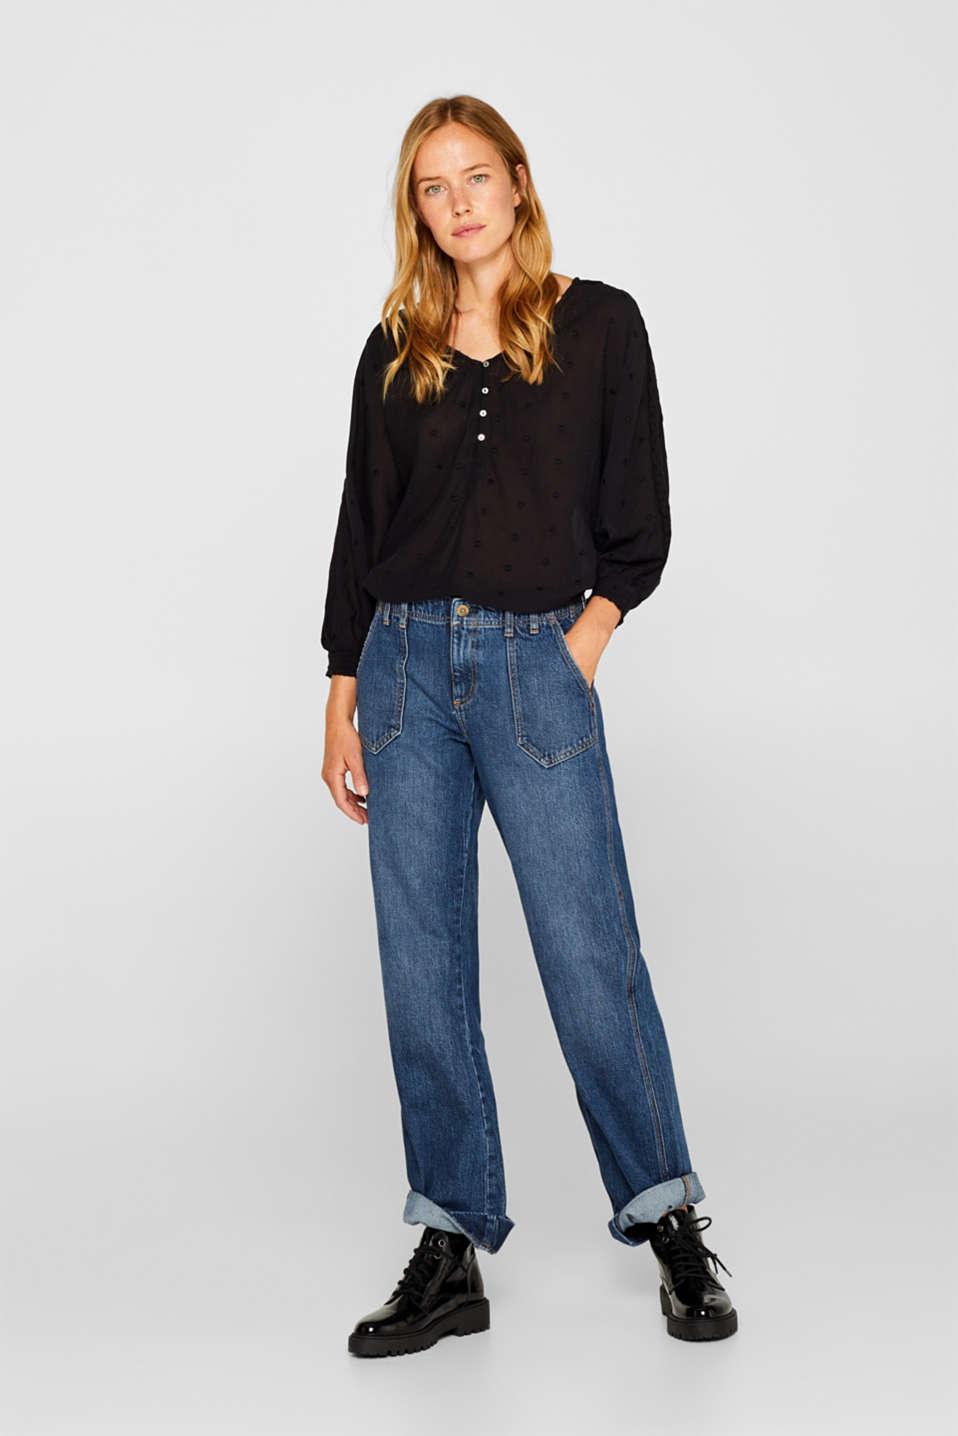 Lace-trimmed blouse, BLACK, detail image number 1